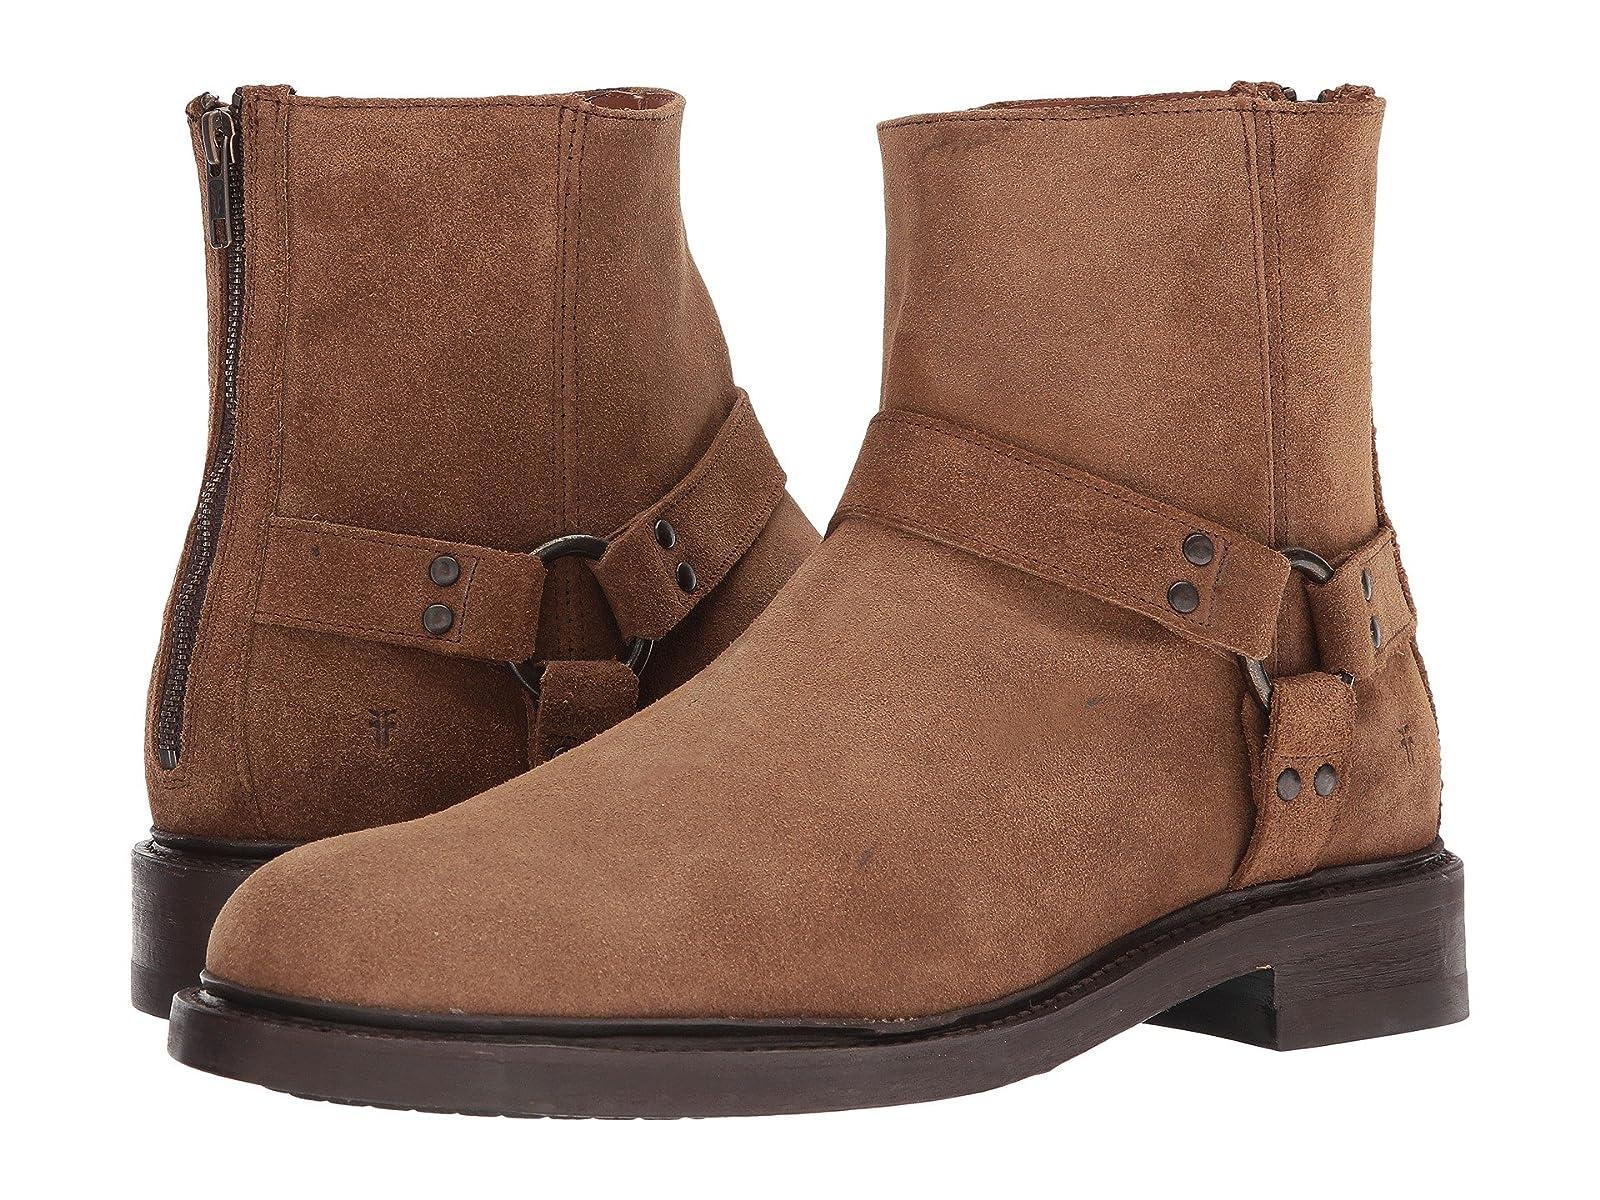 Frye Walt HarnessCheap and distinctive eye-catching shoes